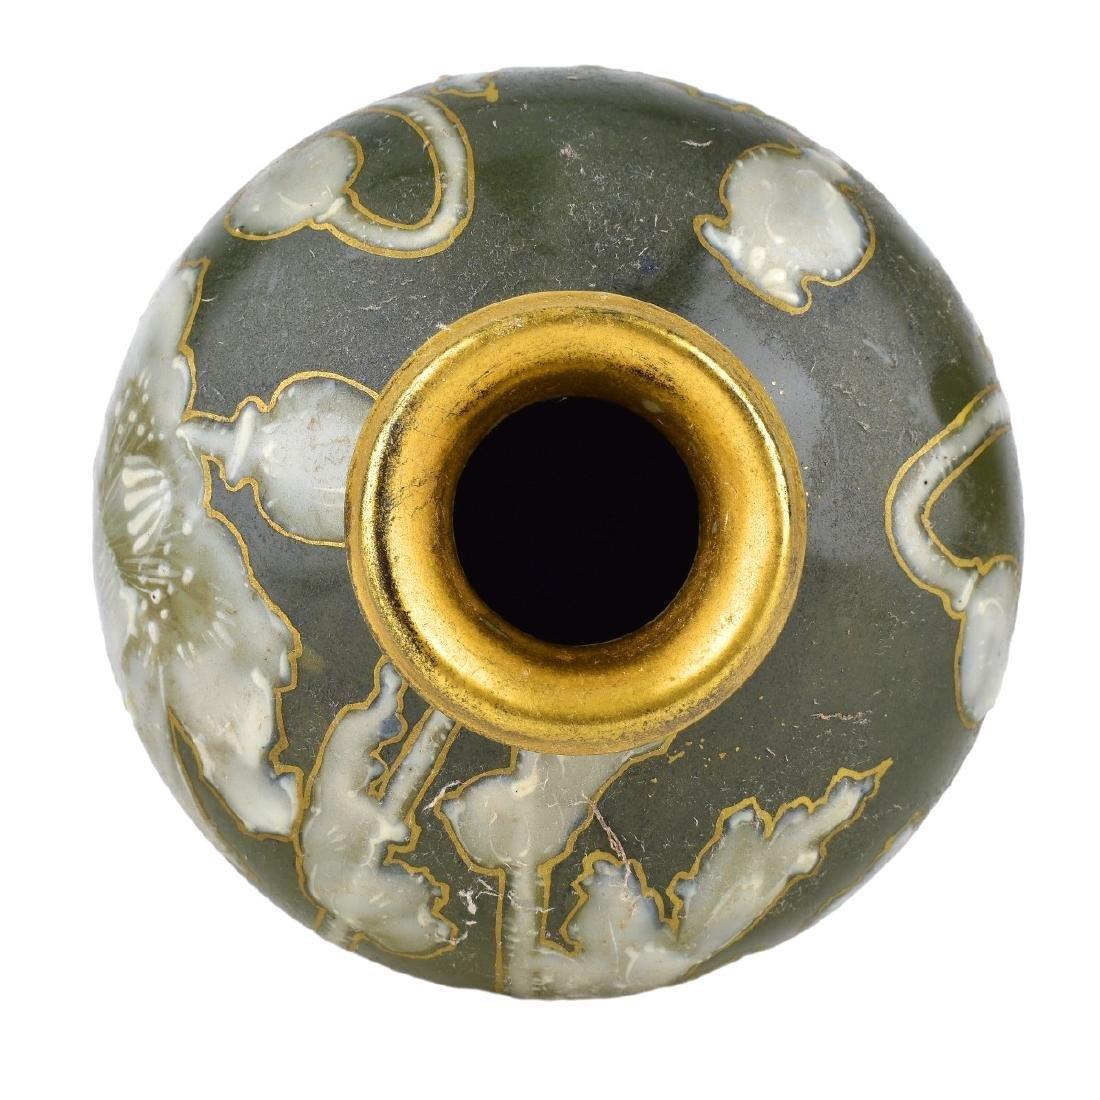 Turn Teplitz Amphora Pottery Vase - 3